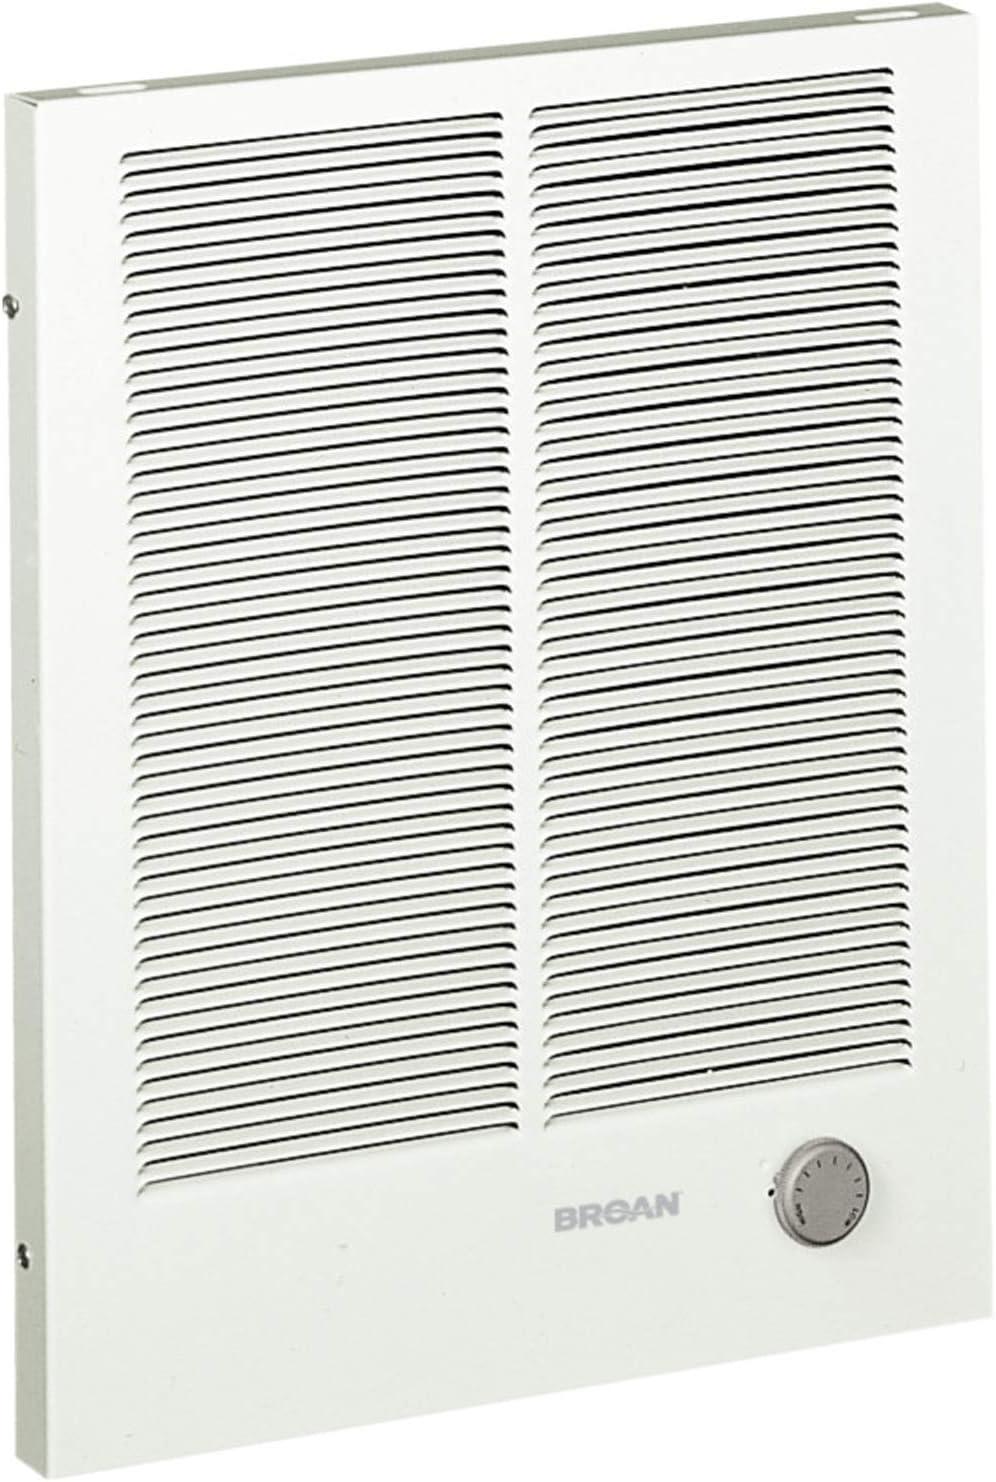 Amazon.com: Broan-NuTone 194 High Capacity Wall Heater, White Painted  Grille, 3000/1500 Watt 240 VAC, 1500/3000: Home ImprovementAmazon.com